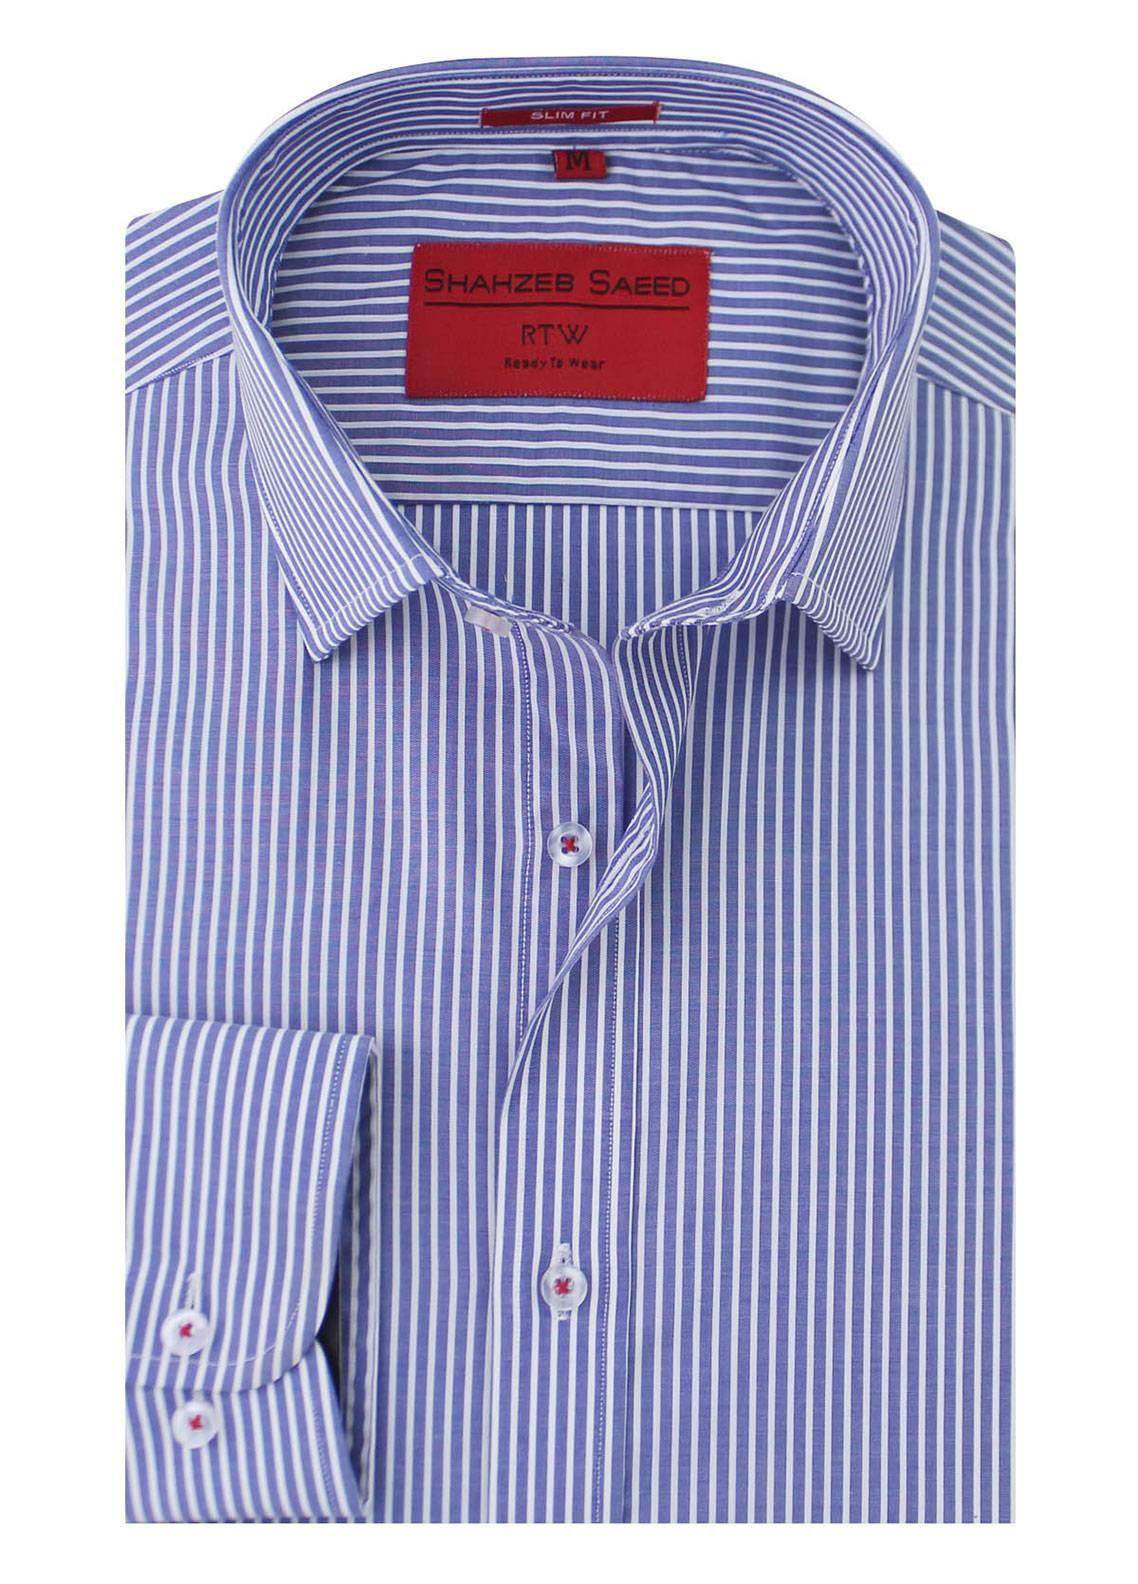 Shahzeb Saeed Cotton Formal Men Shirts - Blue RTW-1333